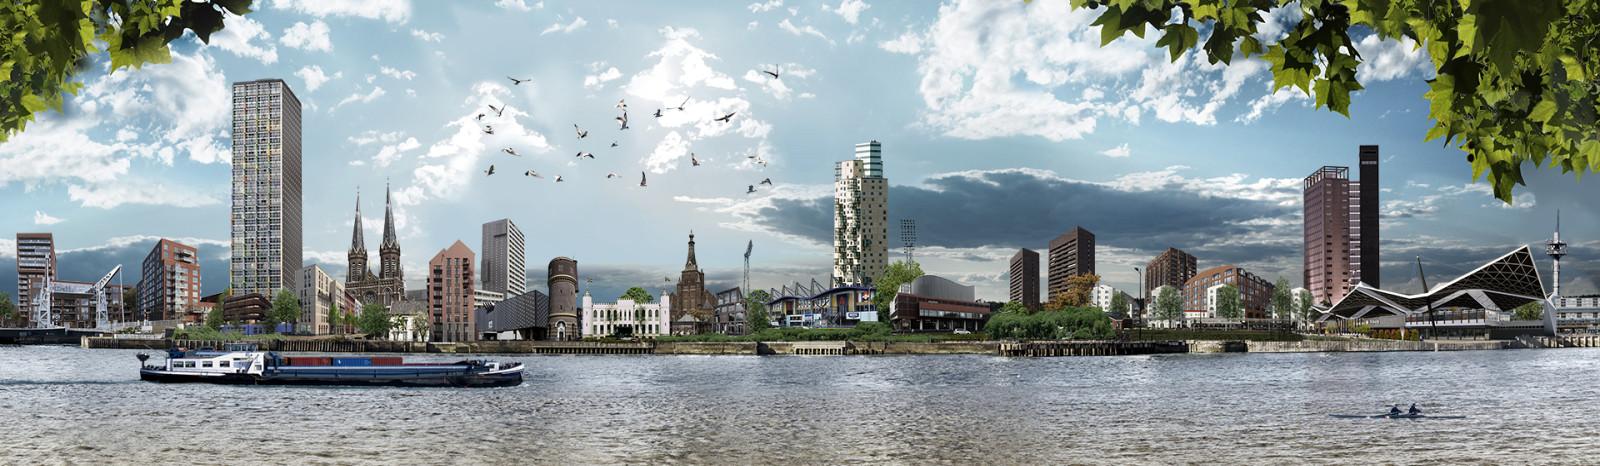 skyline Tilburg Spoorzone kleurrijk